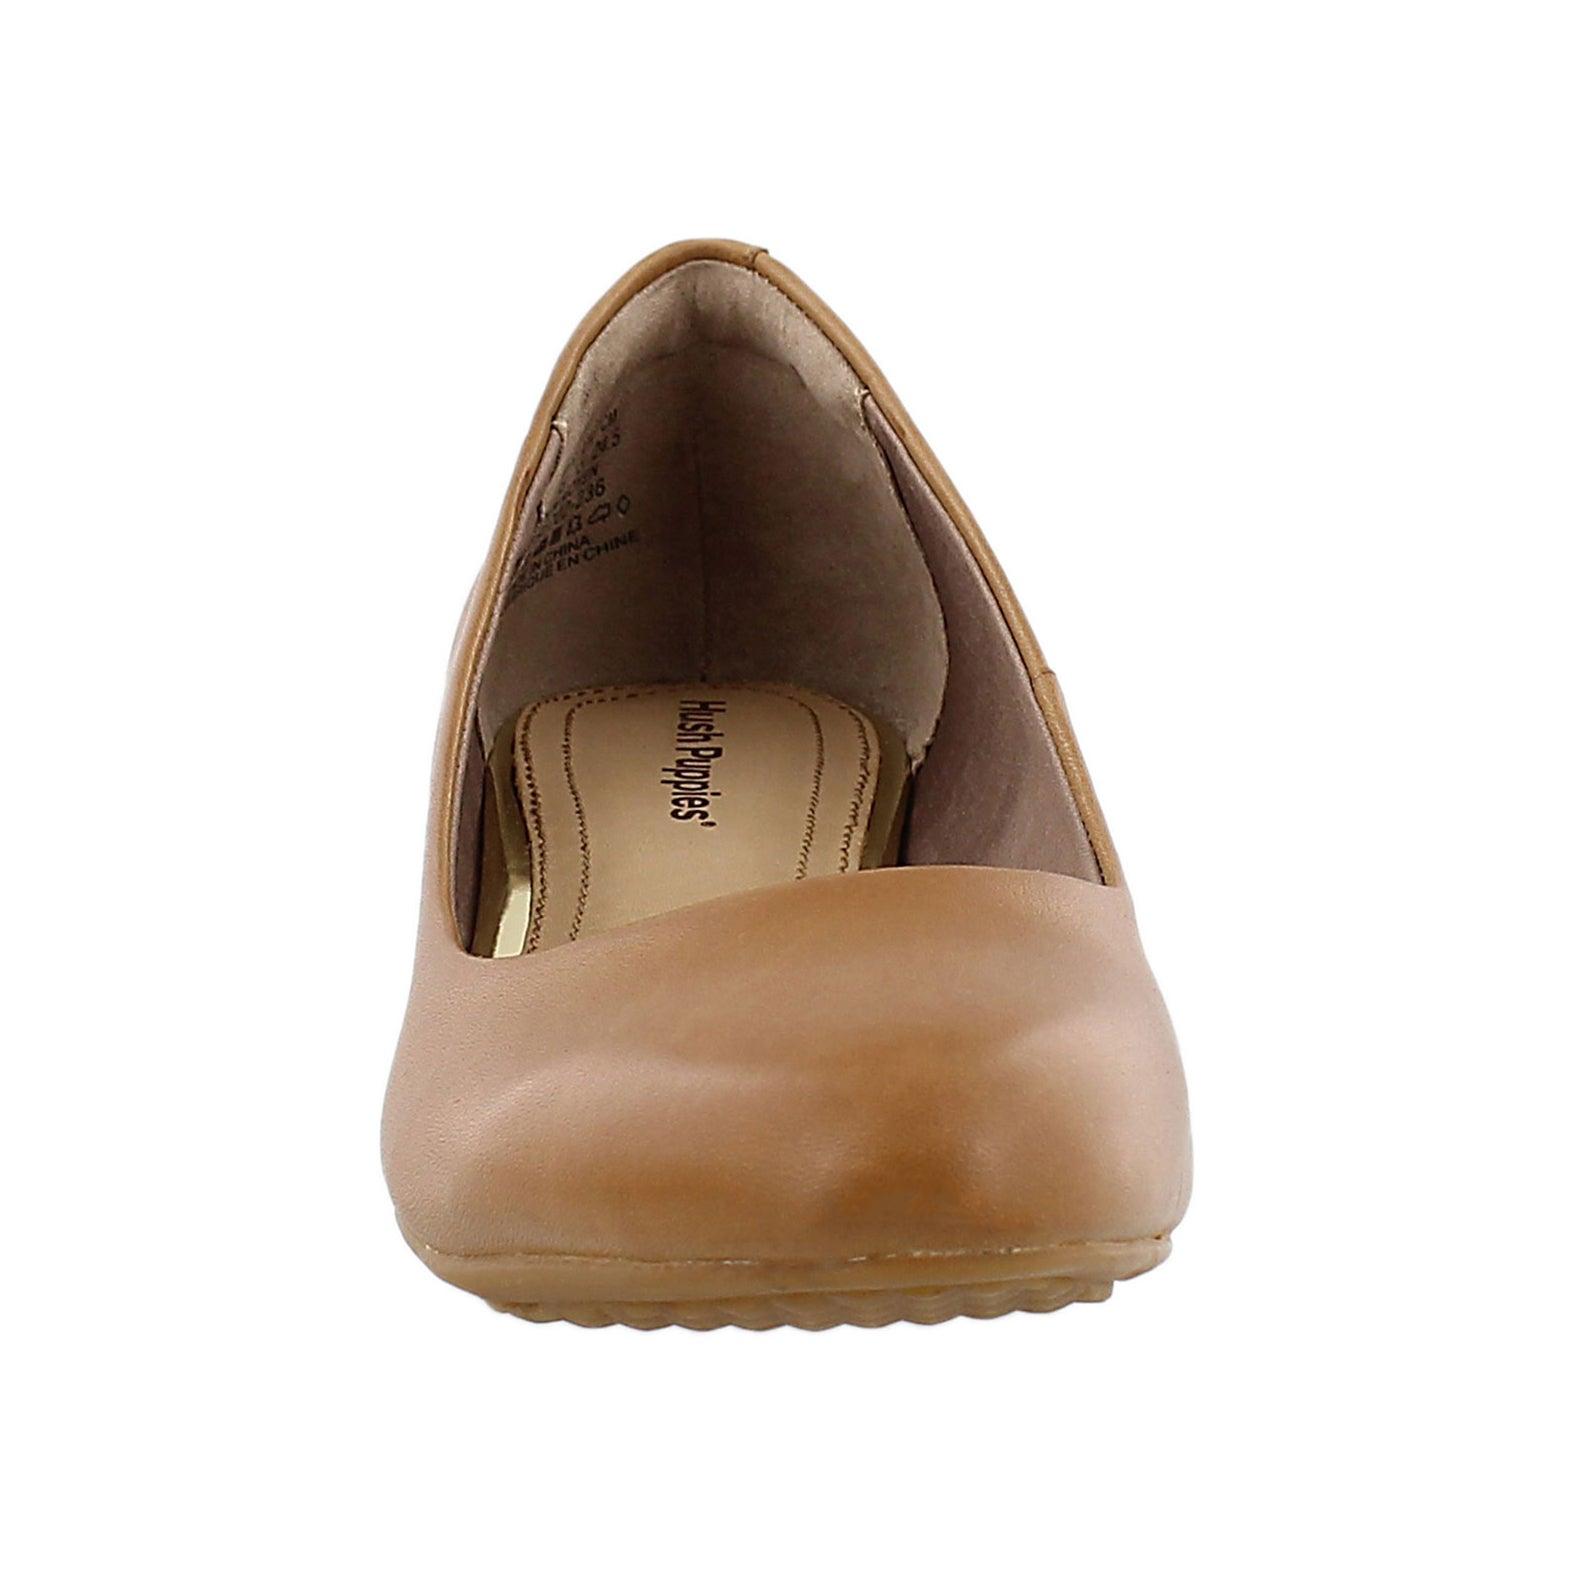 Lds Dot Admire tan wedge dress shoe